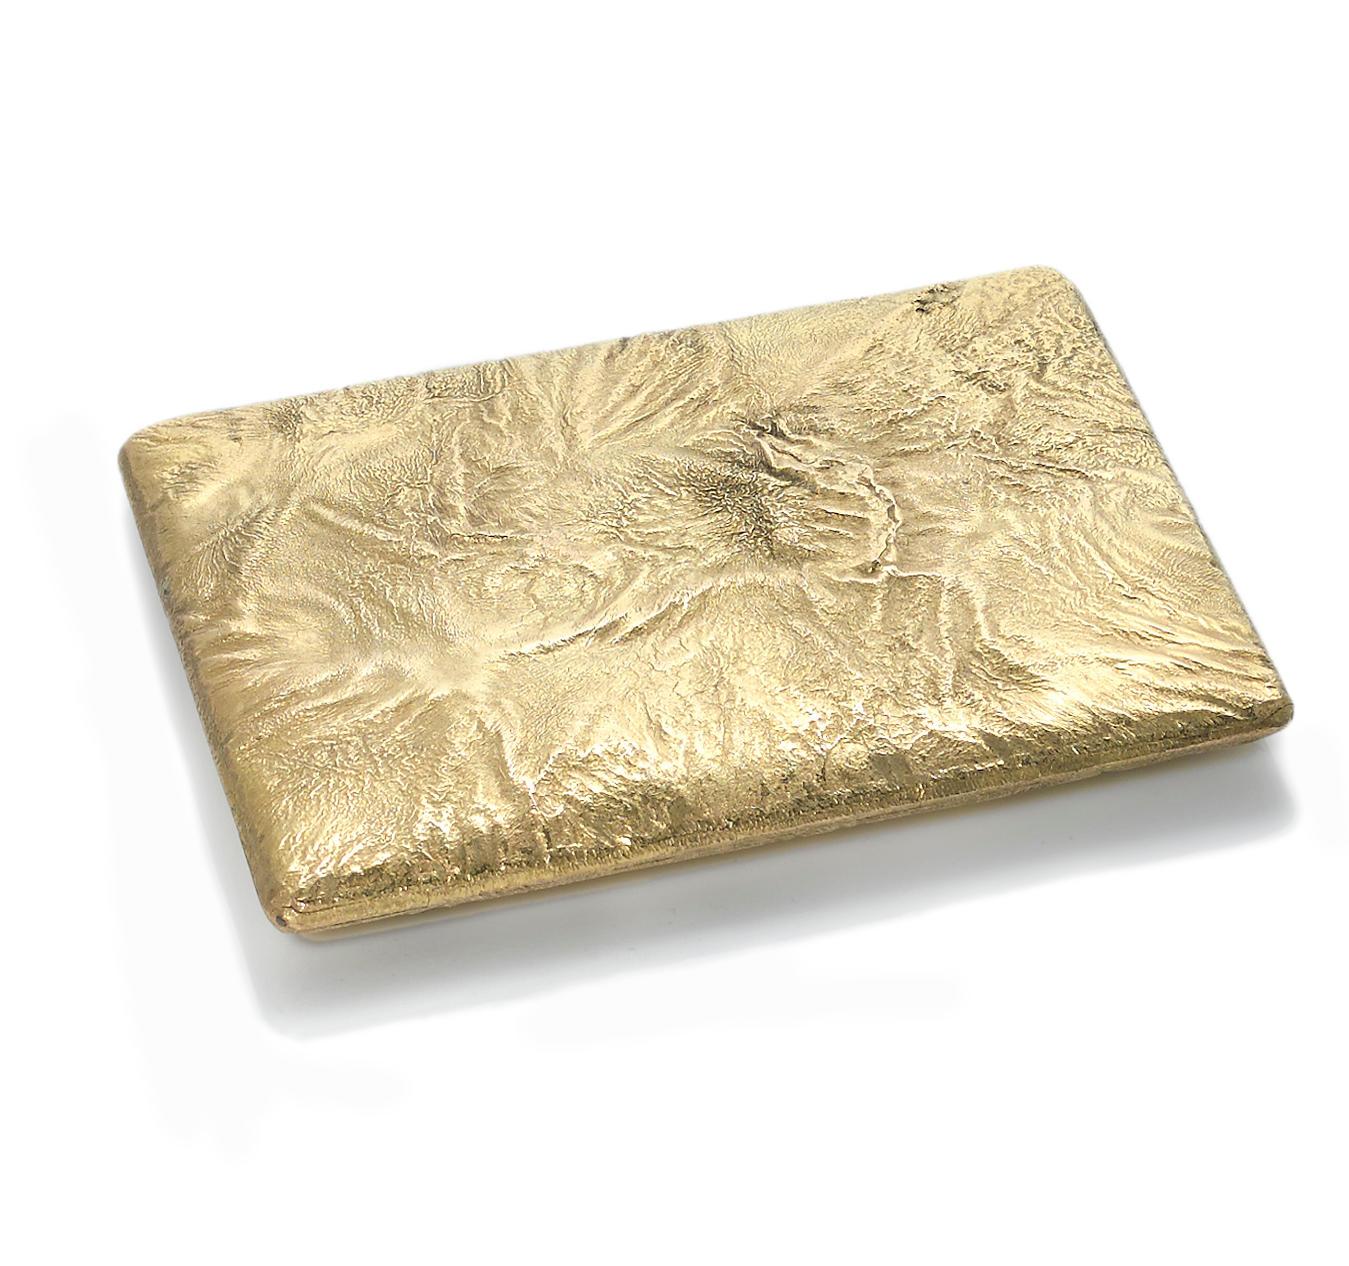 A reticulated nine karat gold